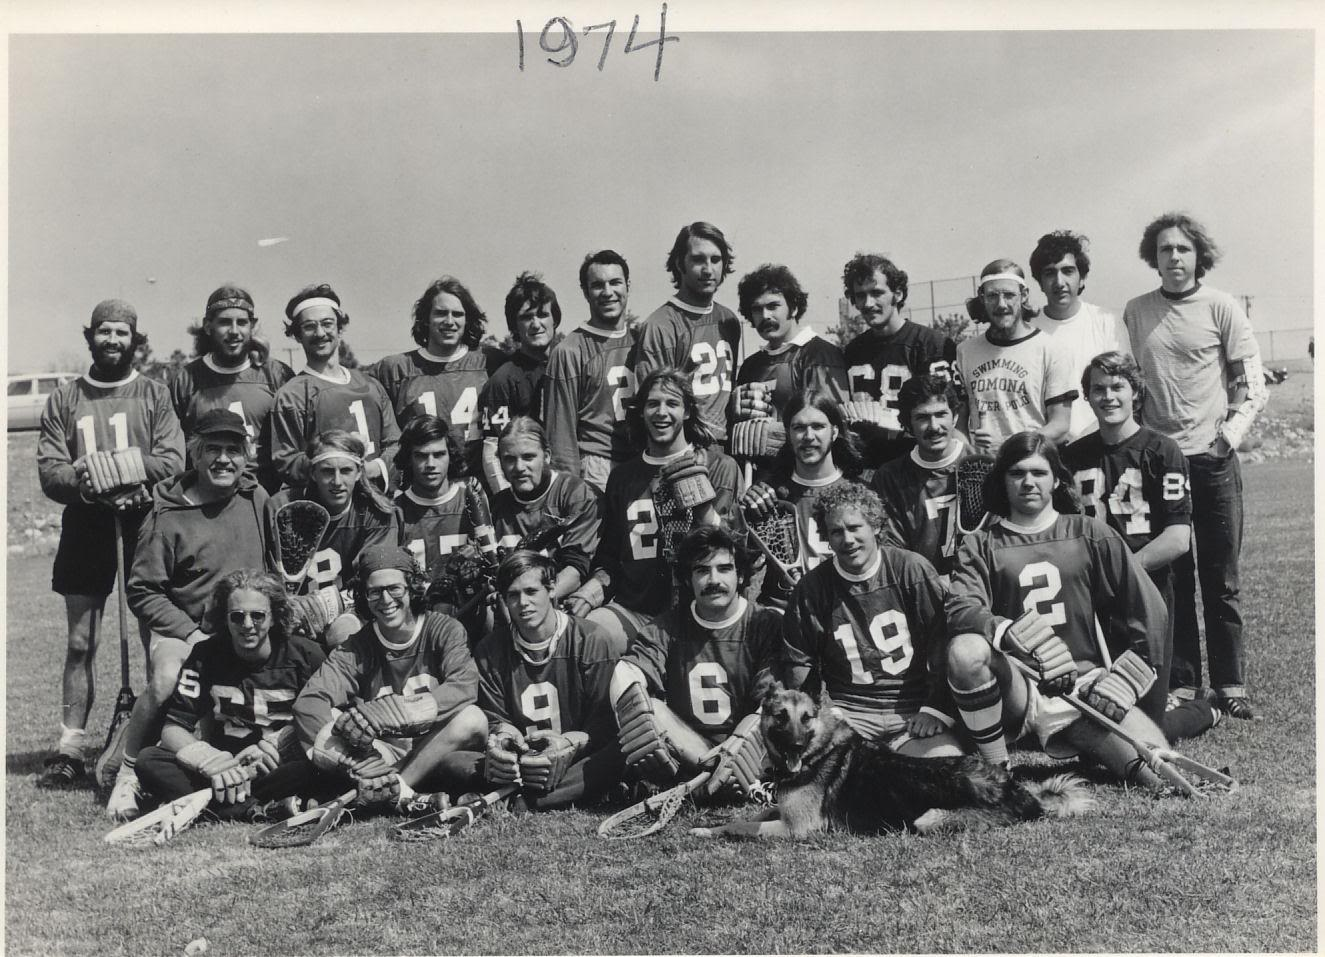 1974 team photo